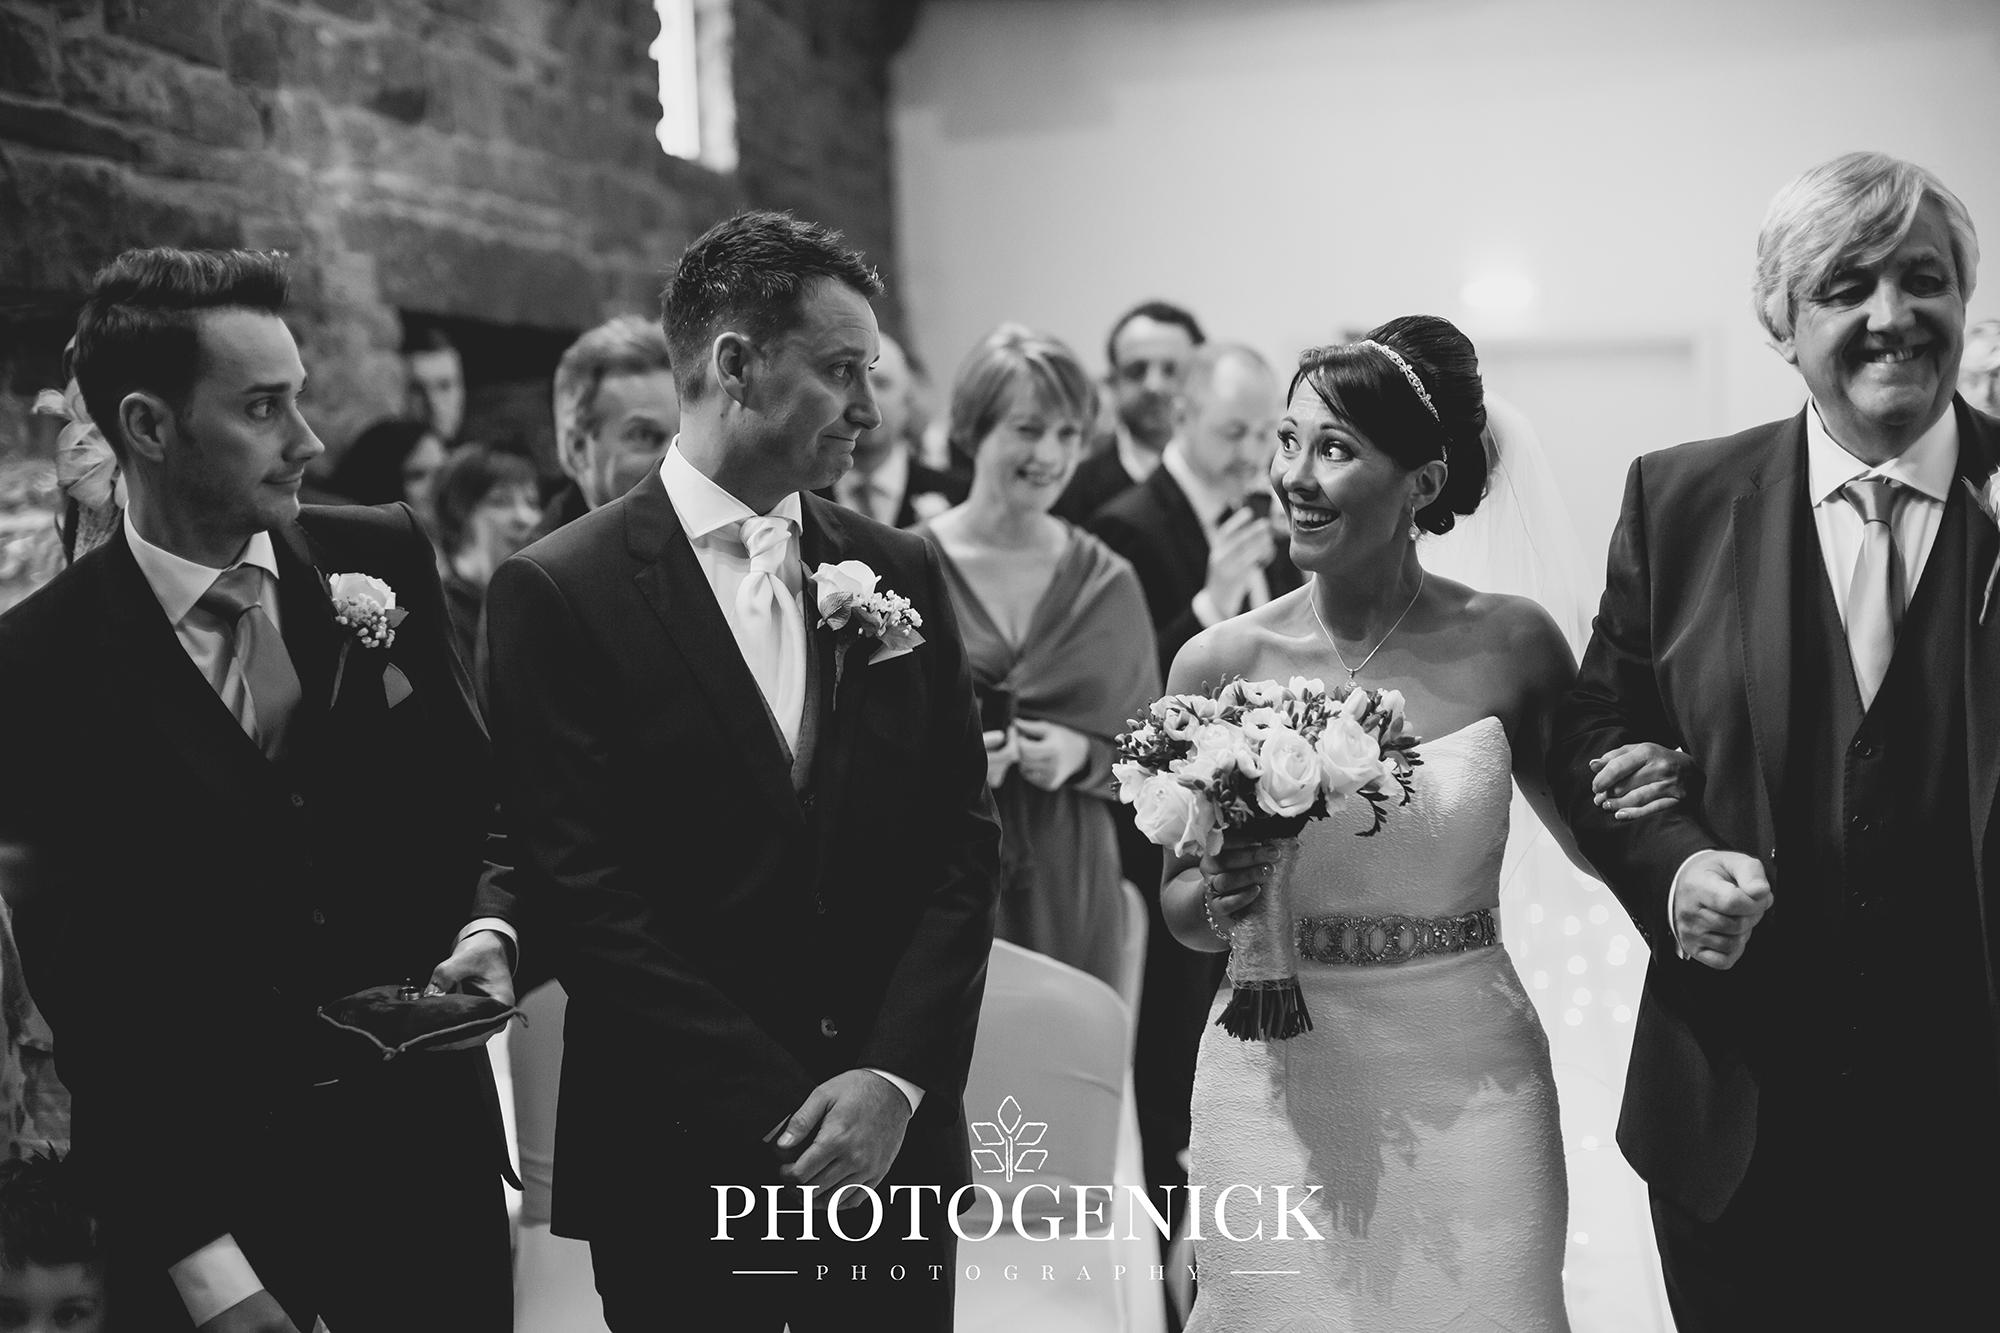 mosborough hall wedding photography.jpg